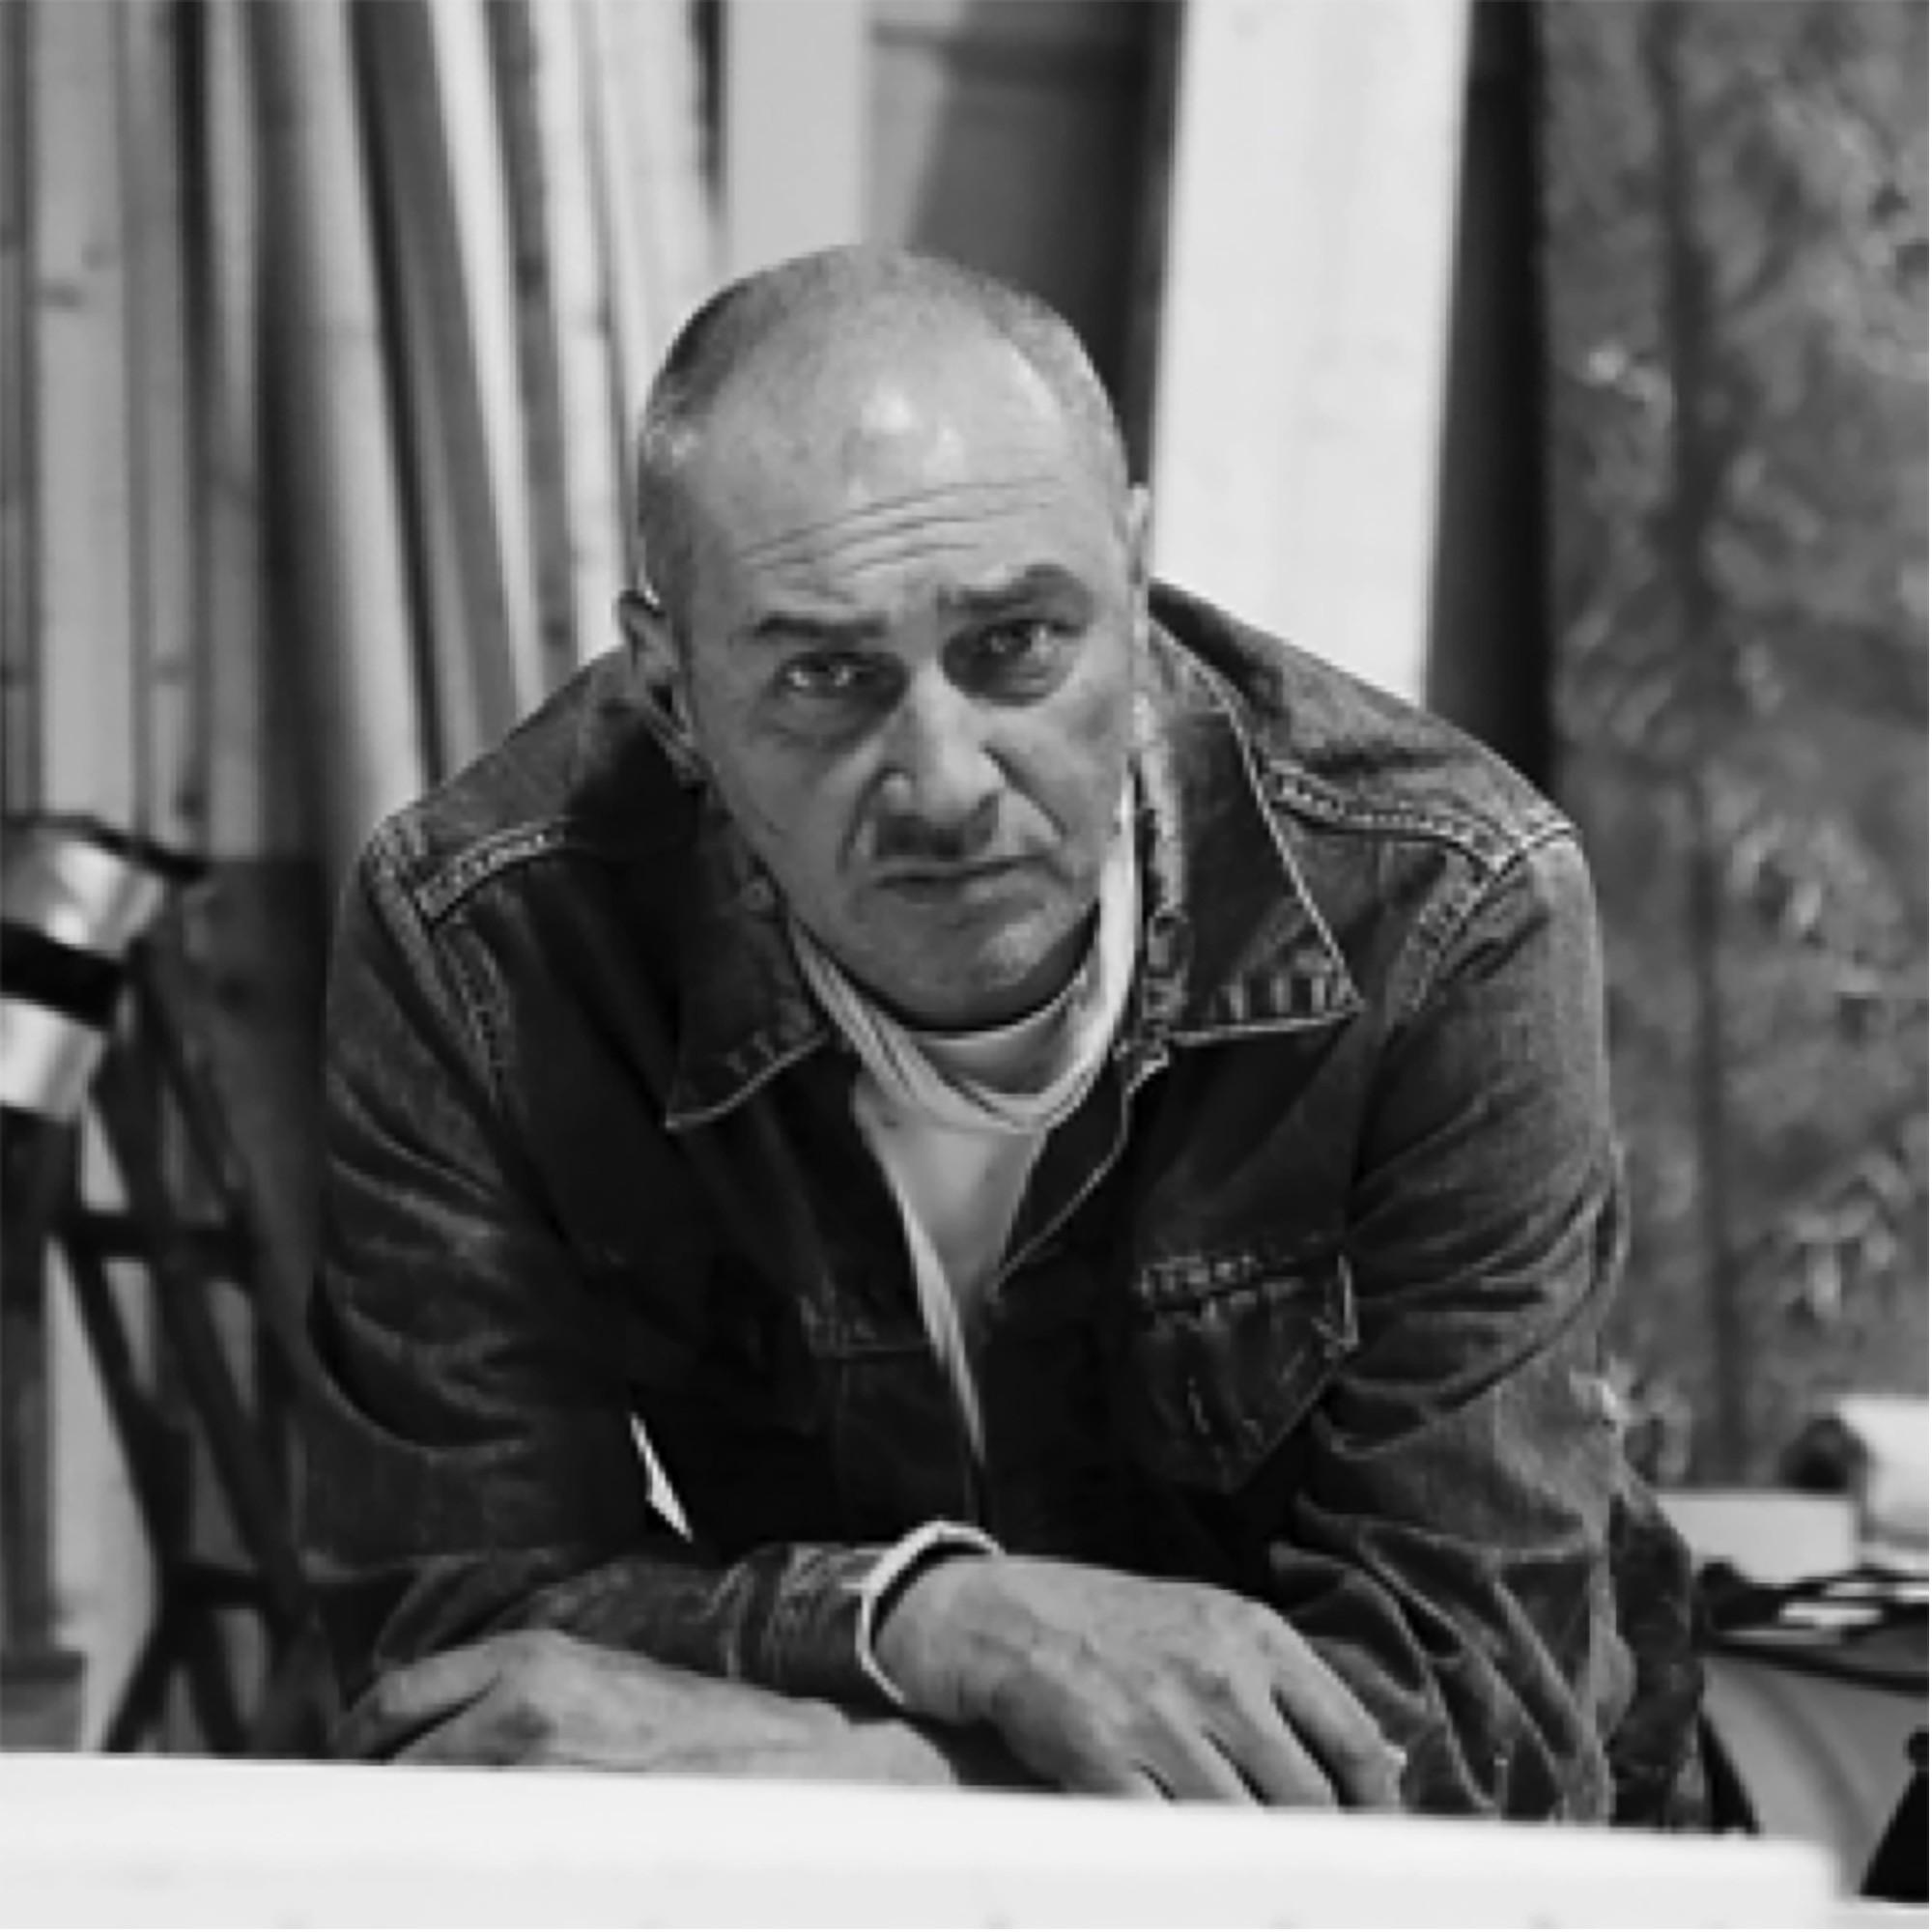 Philippe Pastor (1961-)